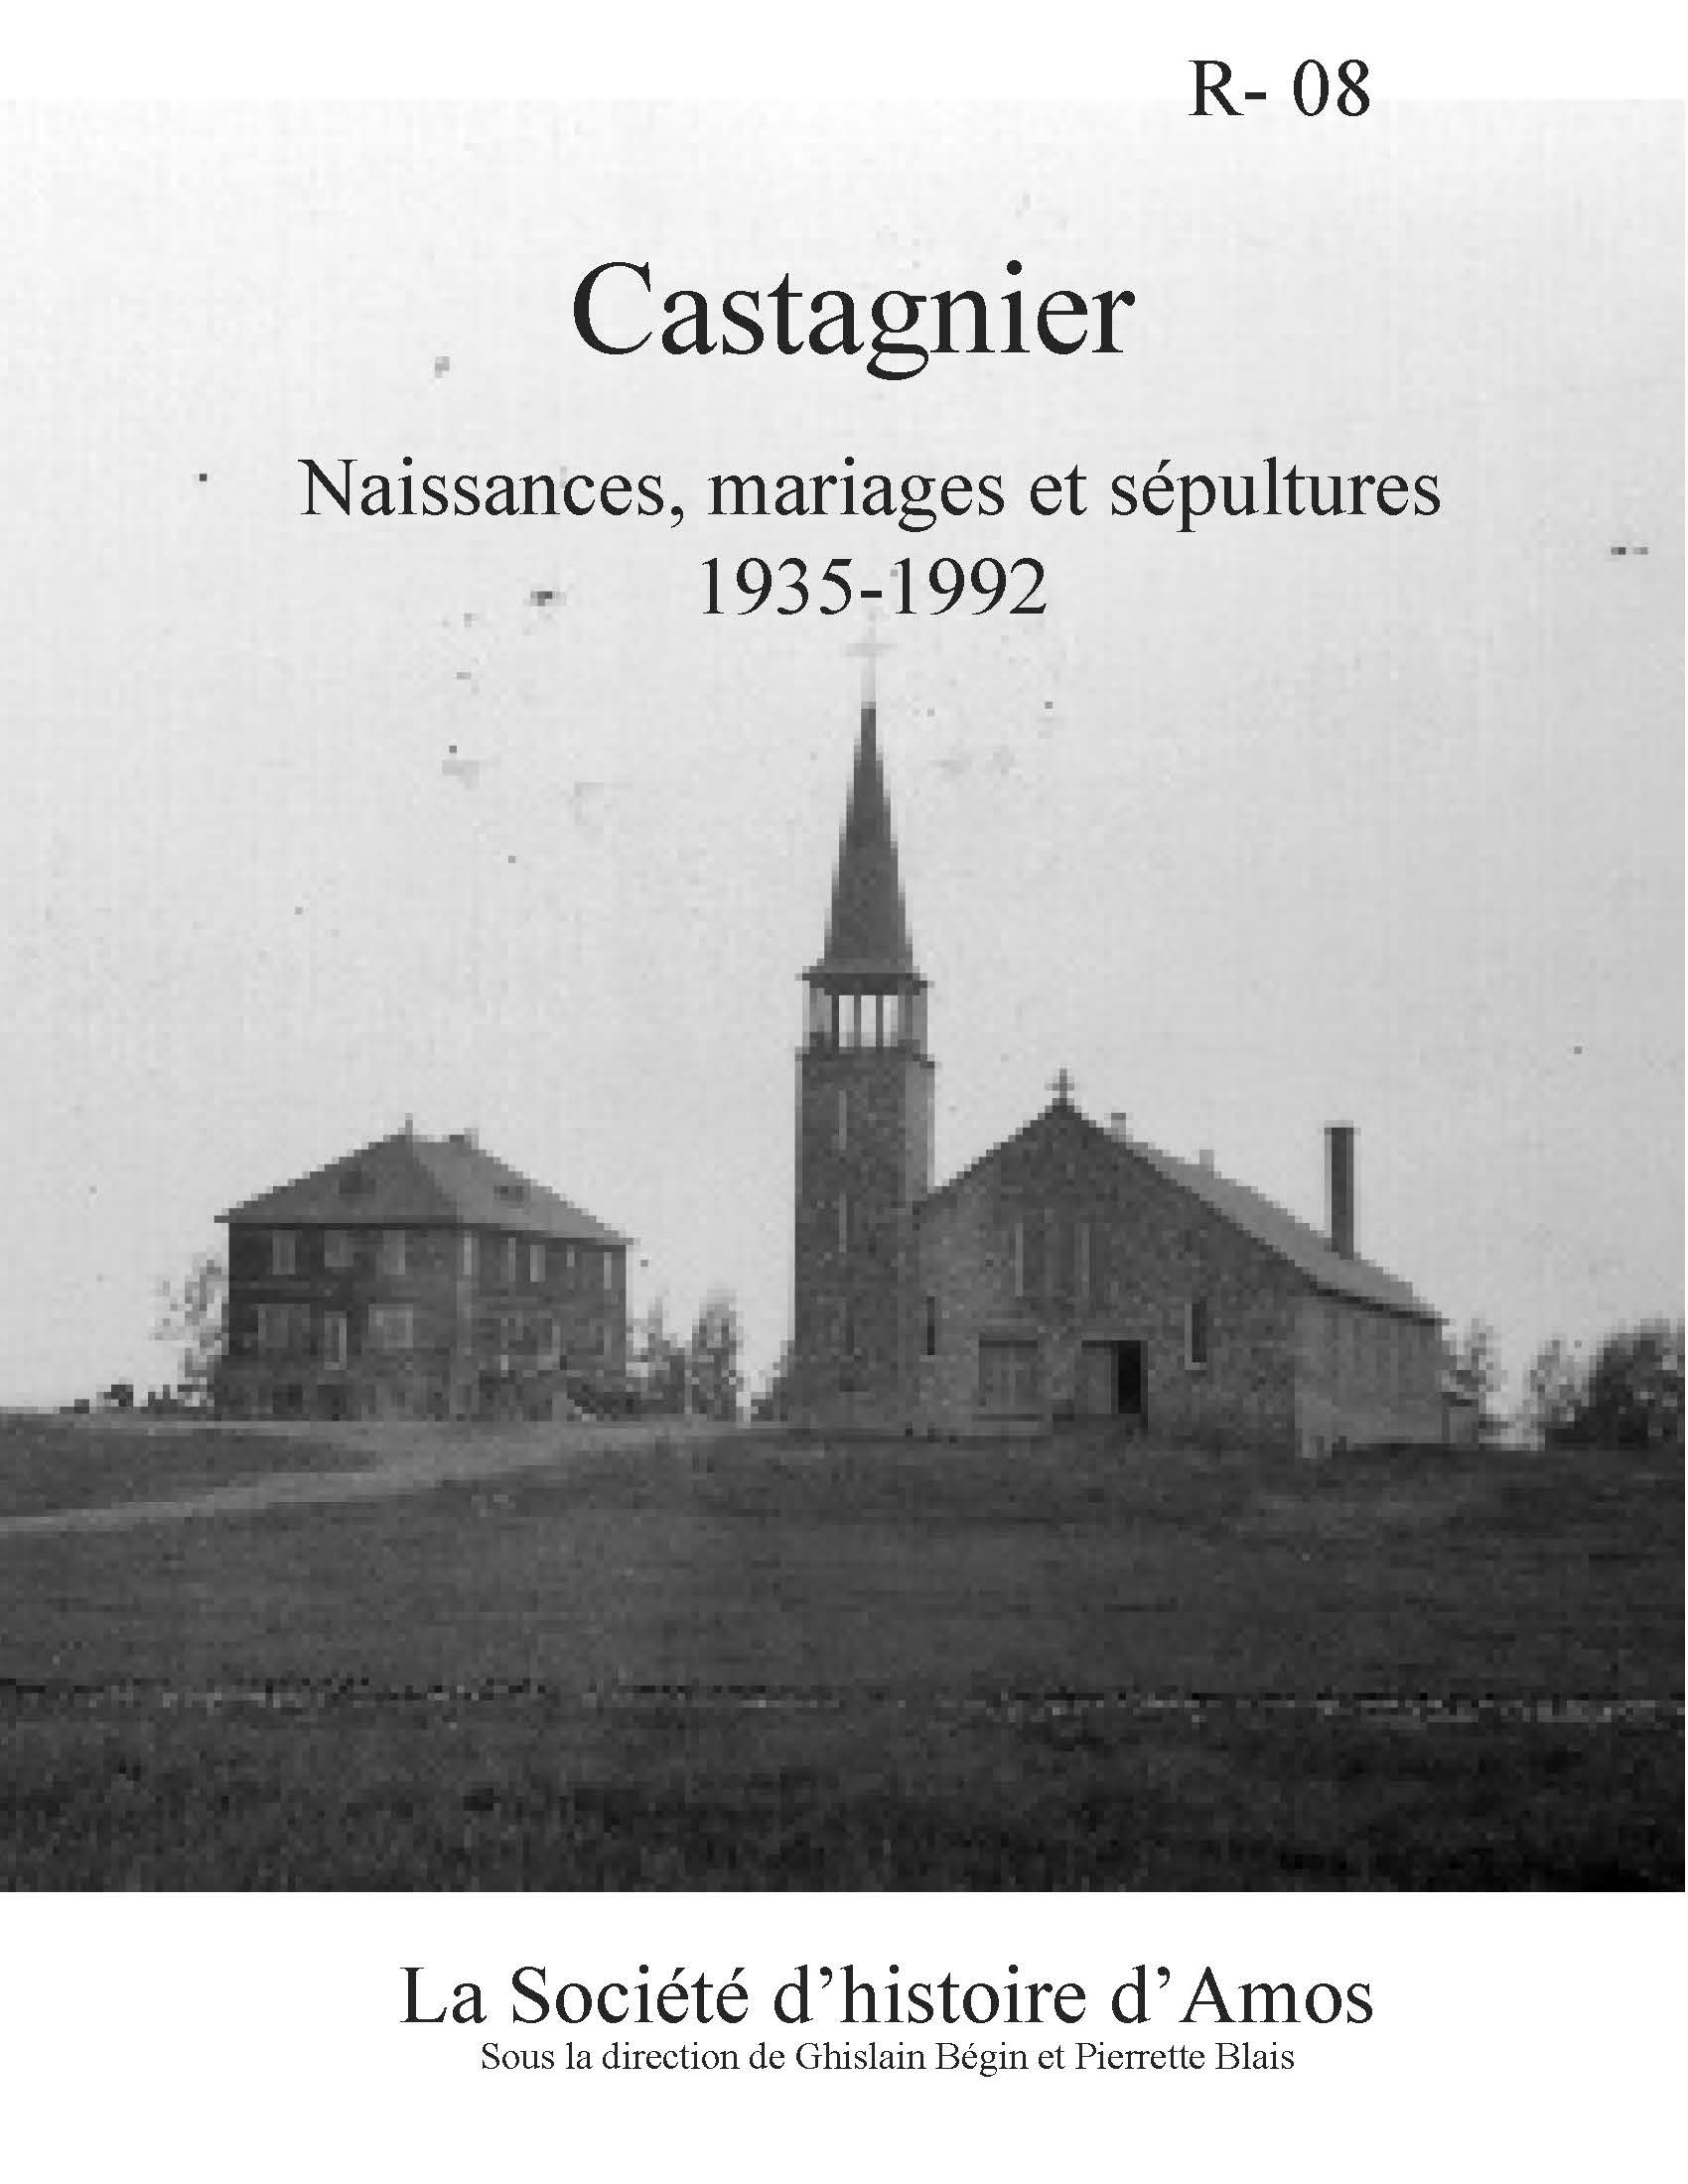 R-08 Castagnier